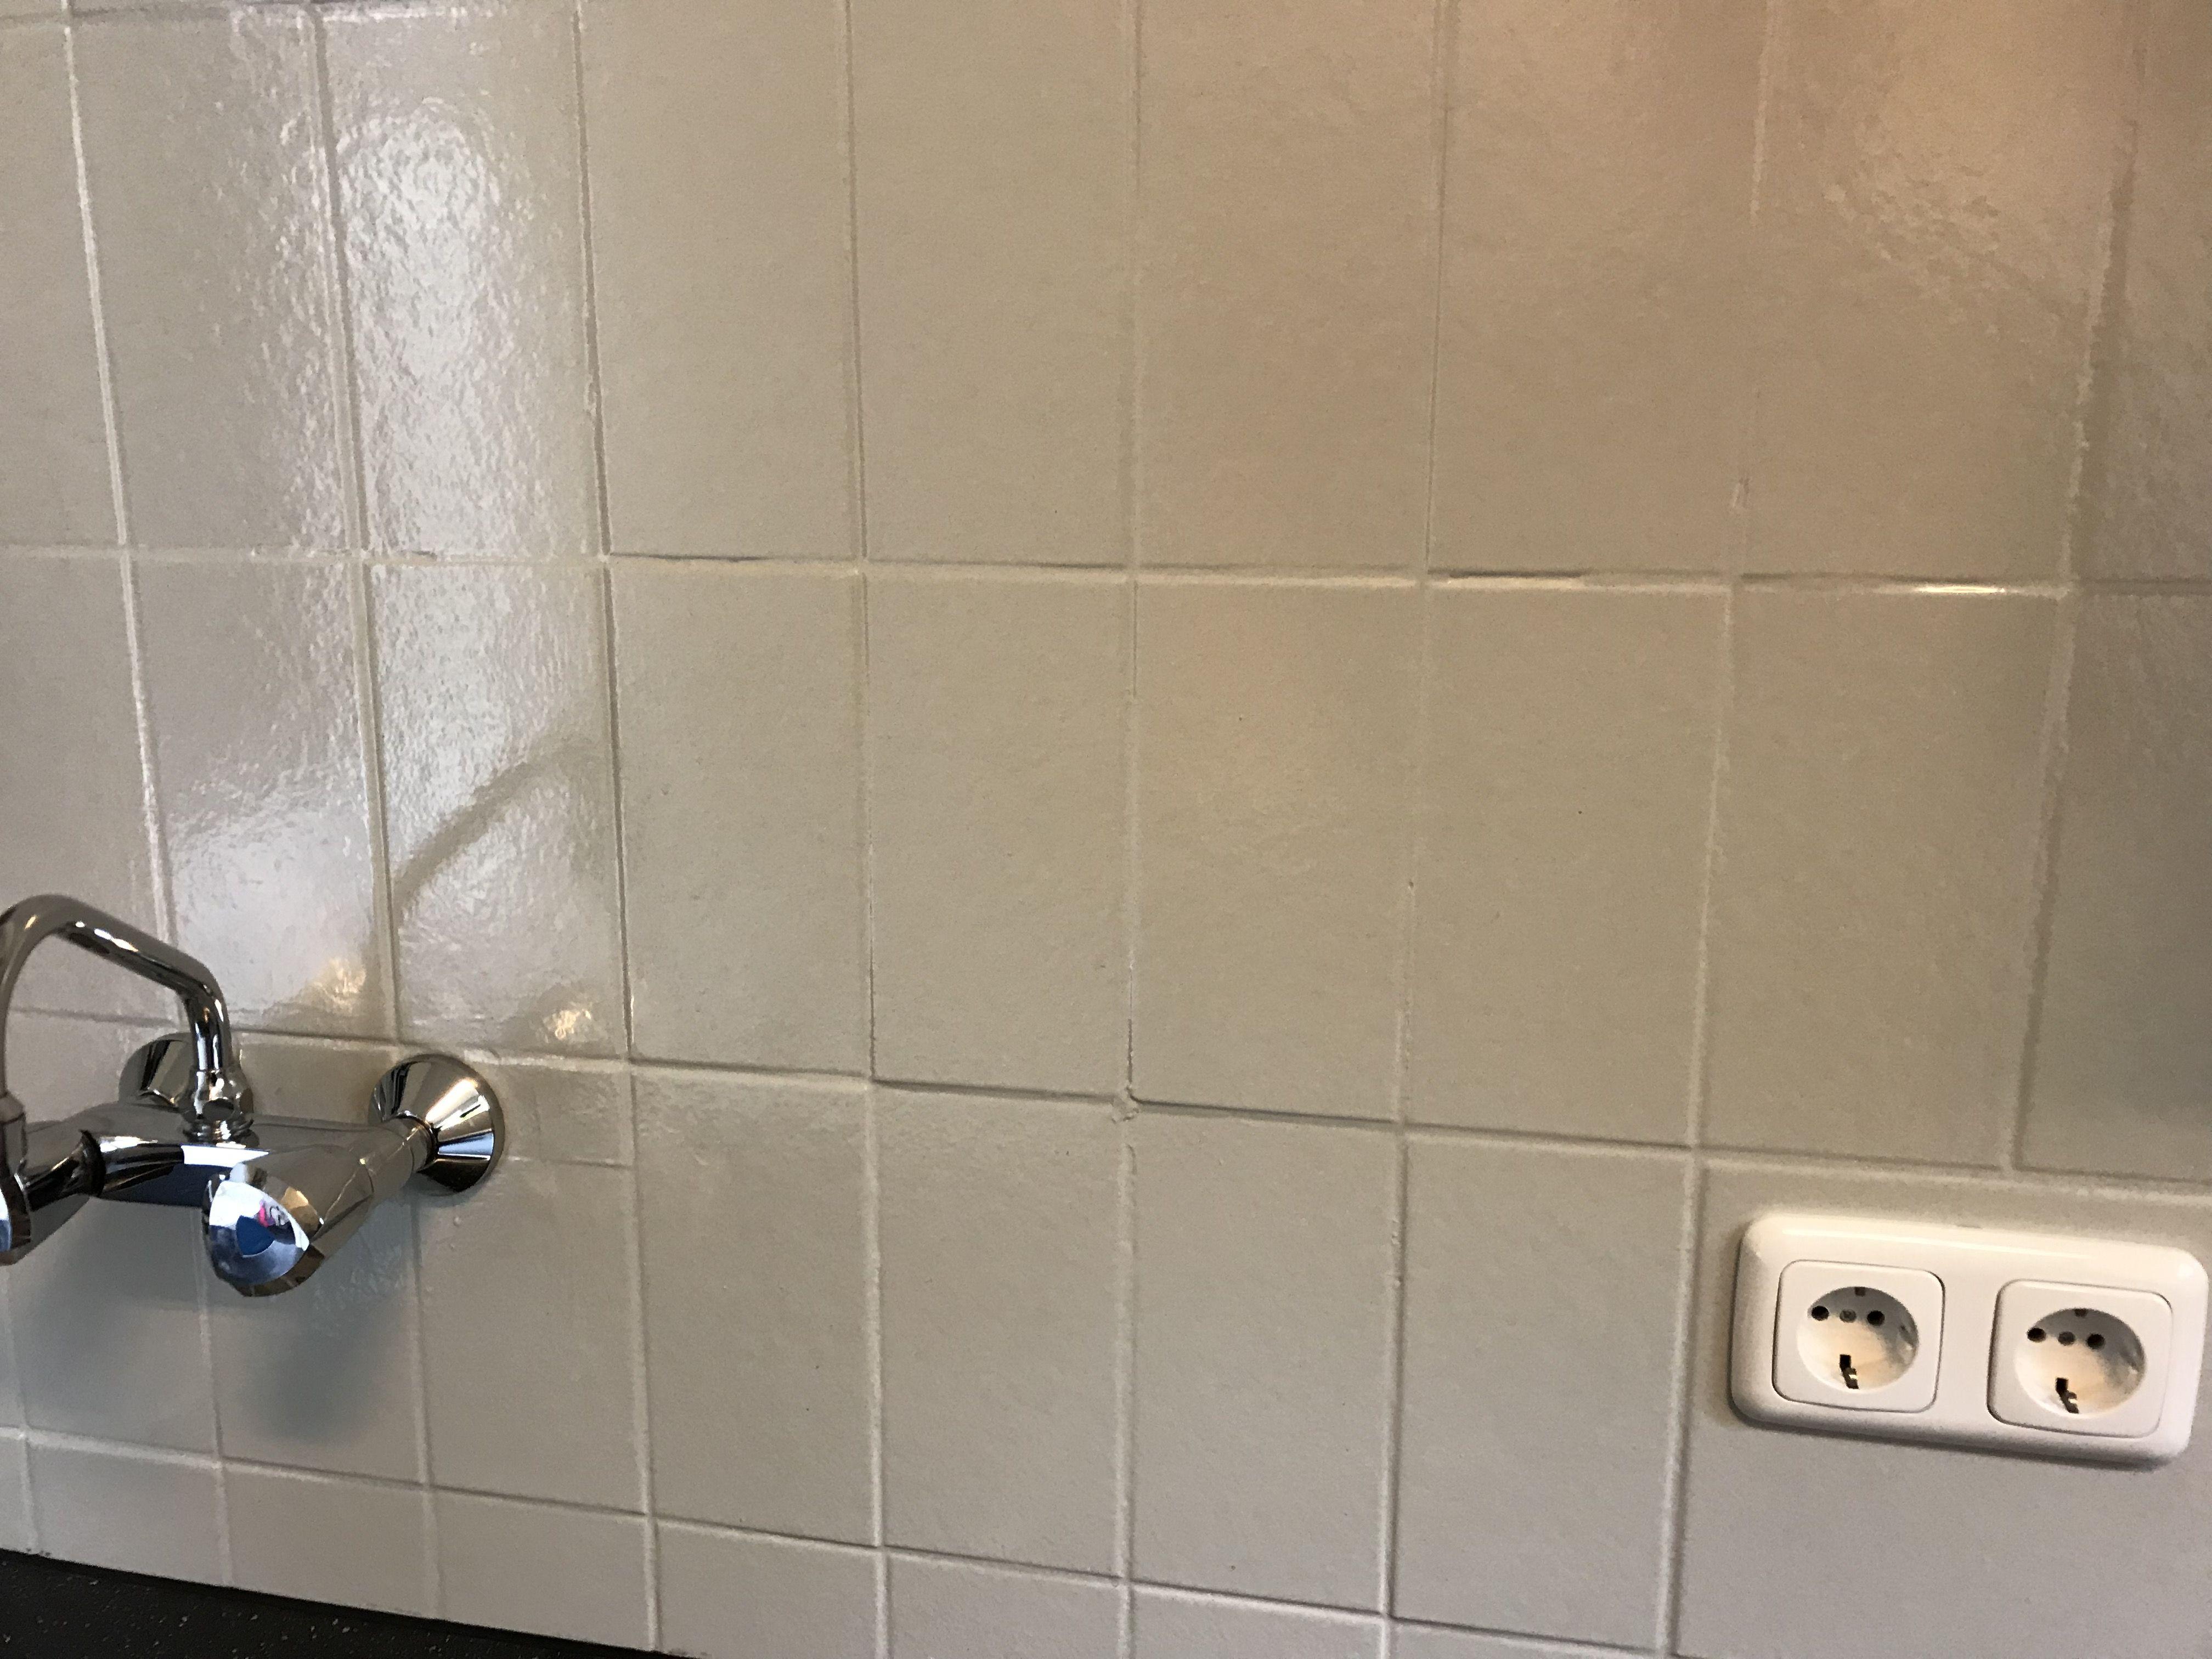 Welp Tegels verven met betonverf of muurverf is geen probleem - Tegels JI-67